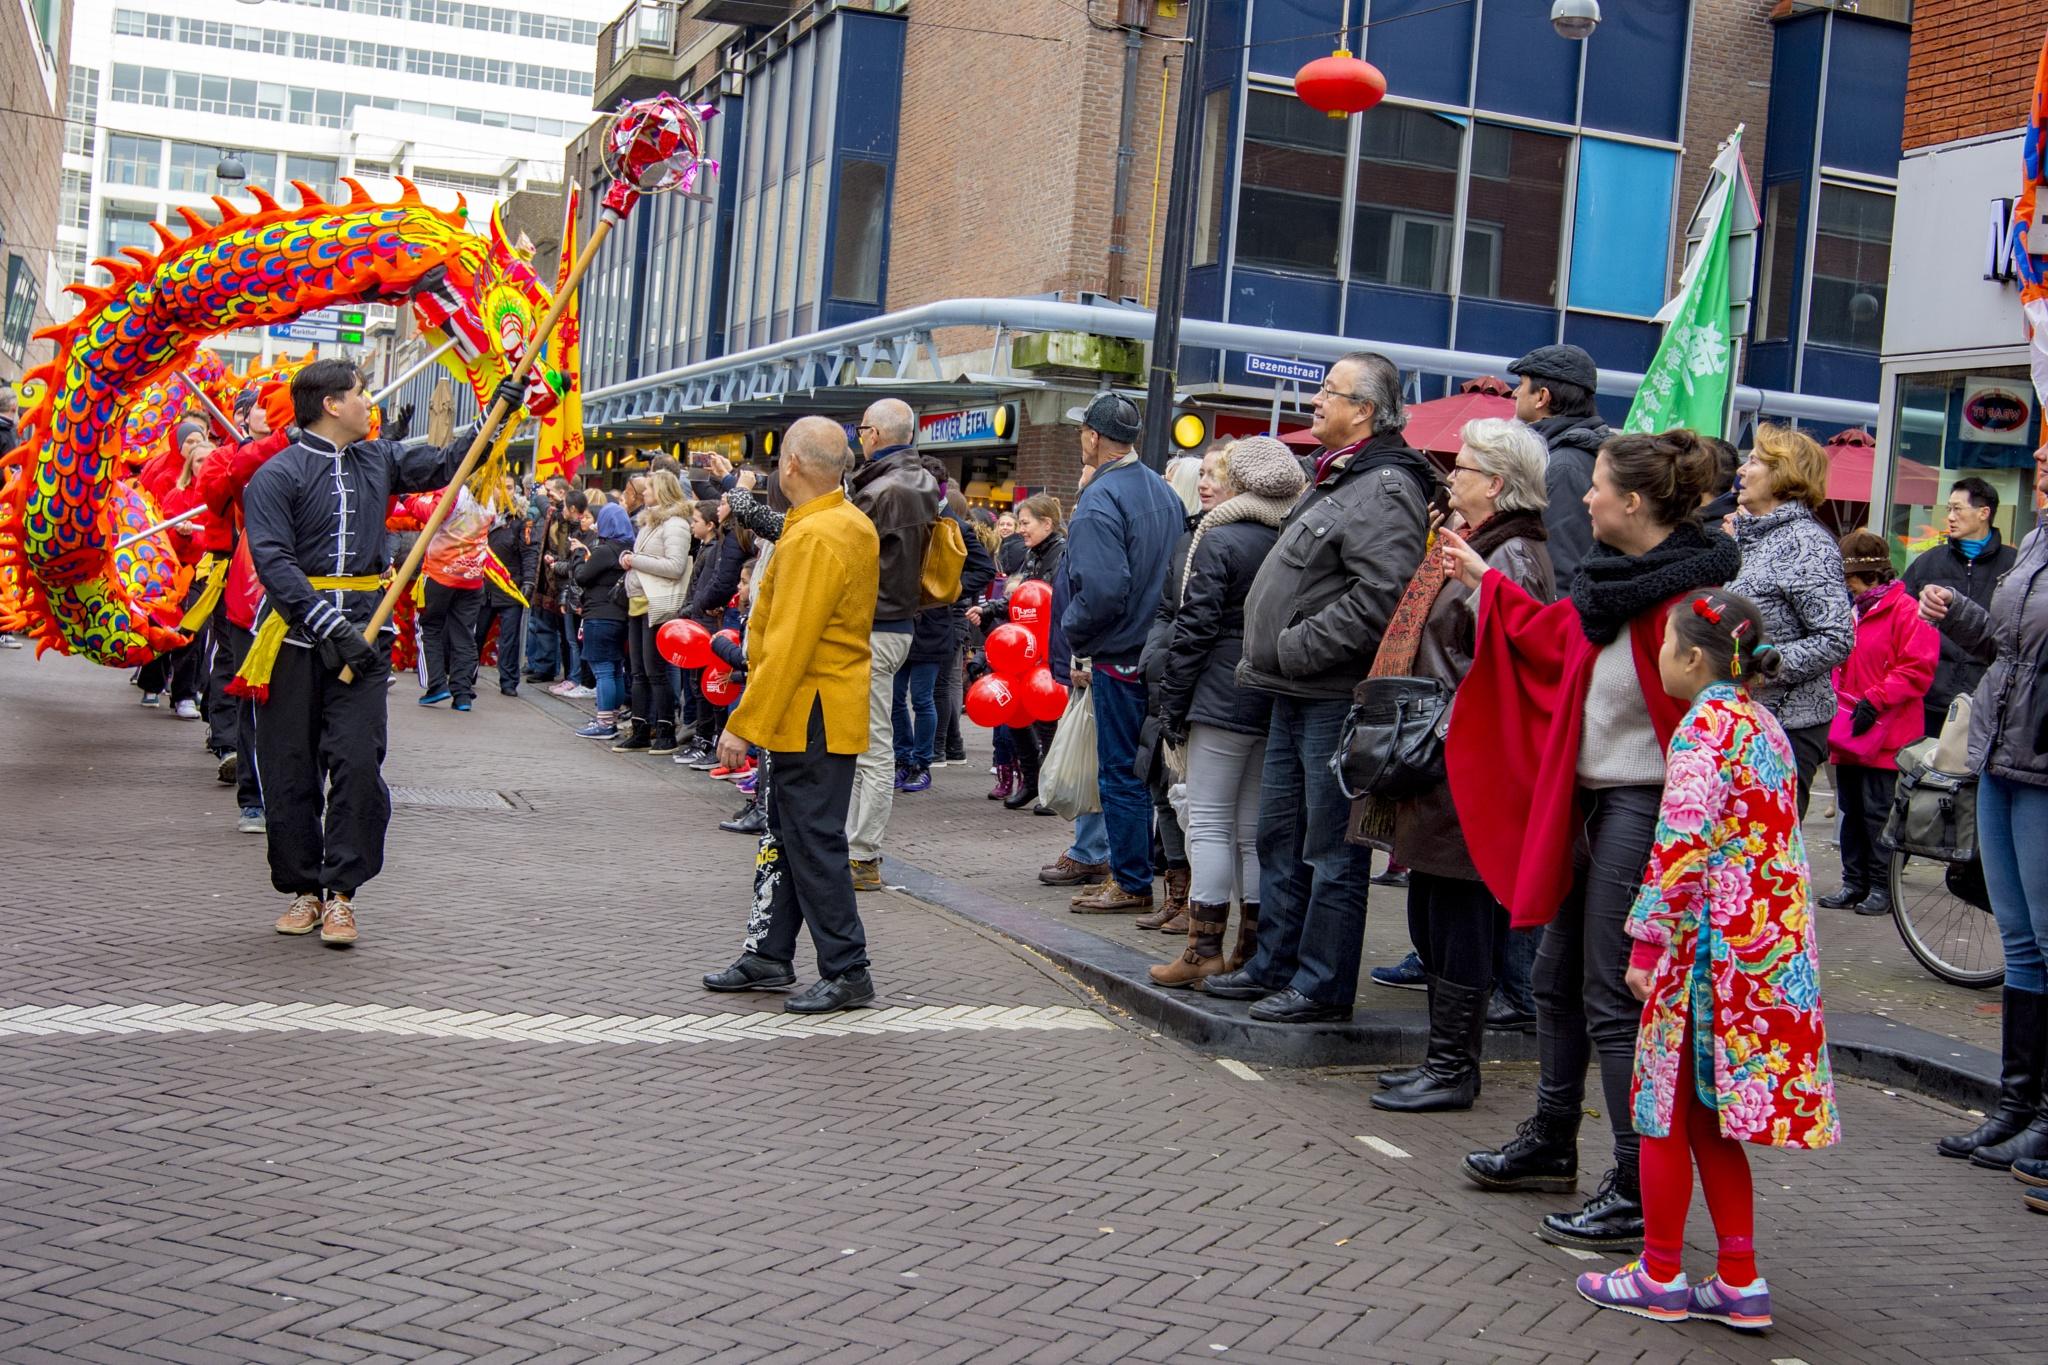 Chinees Nieuwjaar viering in Den Haag  by ricsas90